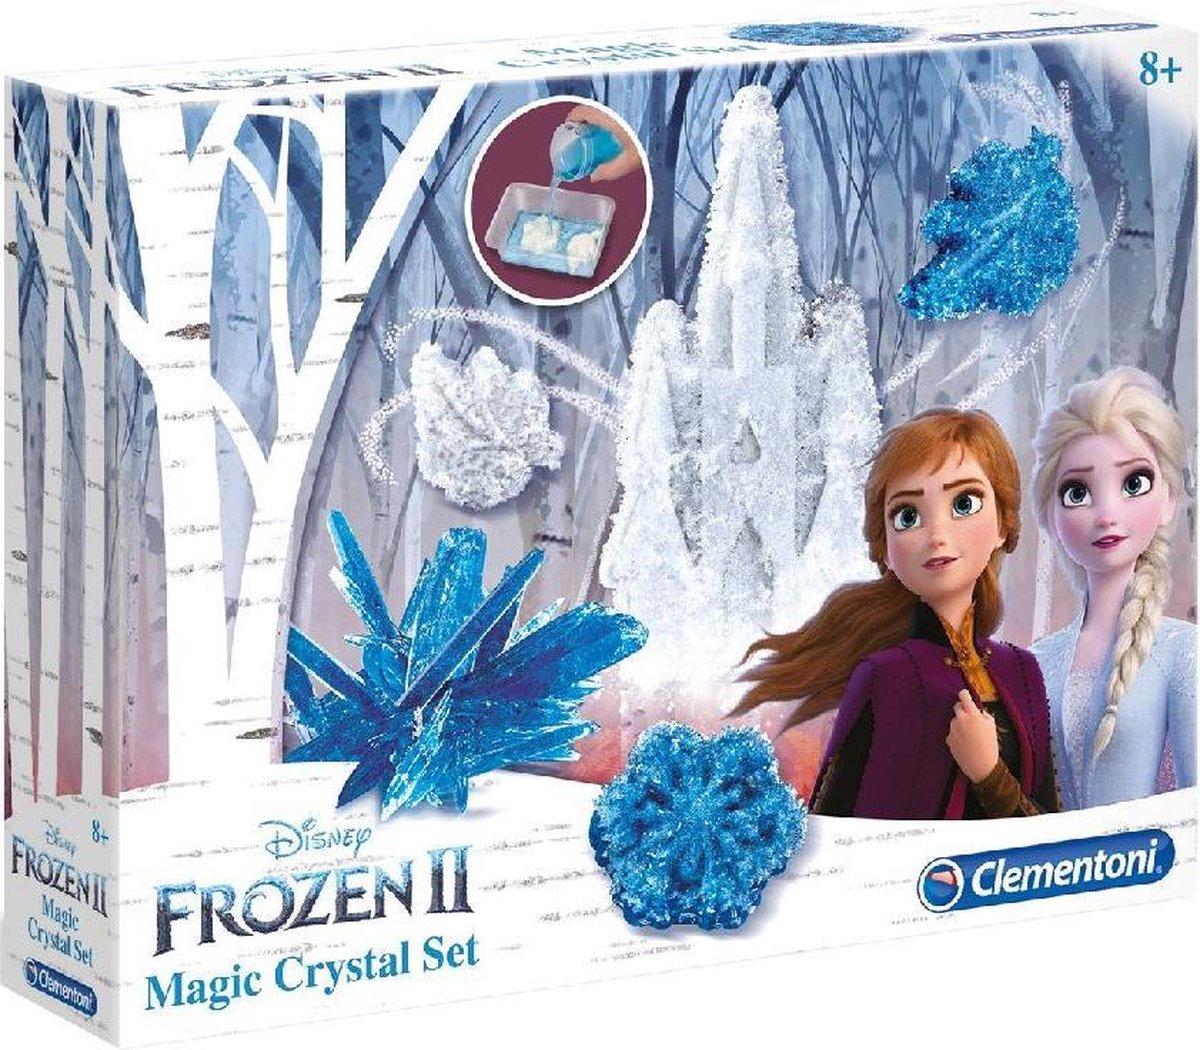 Clementoni Frozen 2 Magic Crystal Set